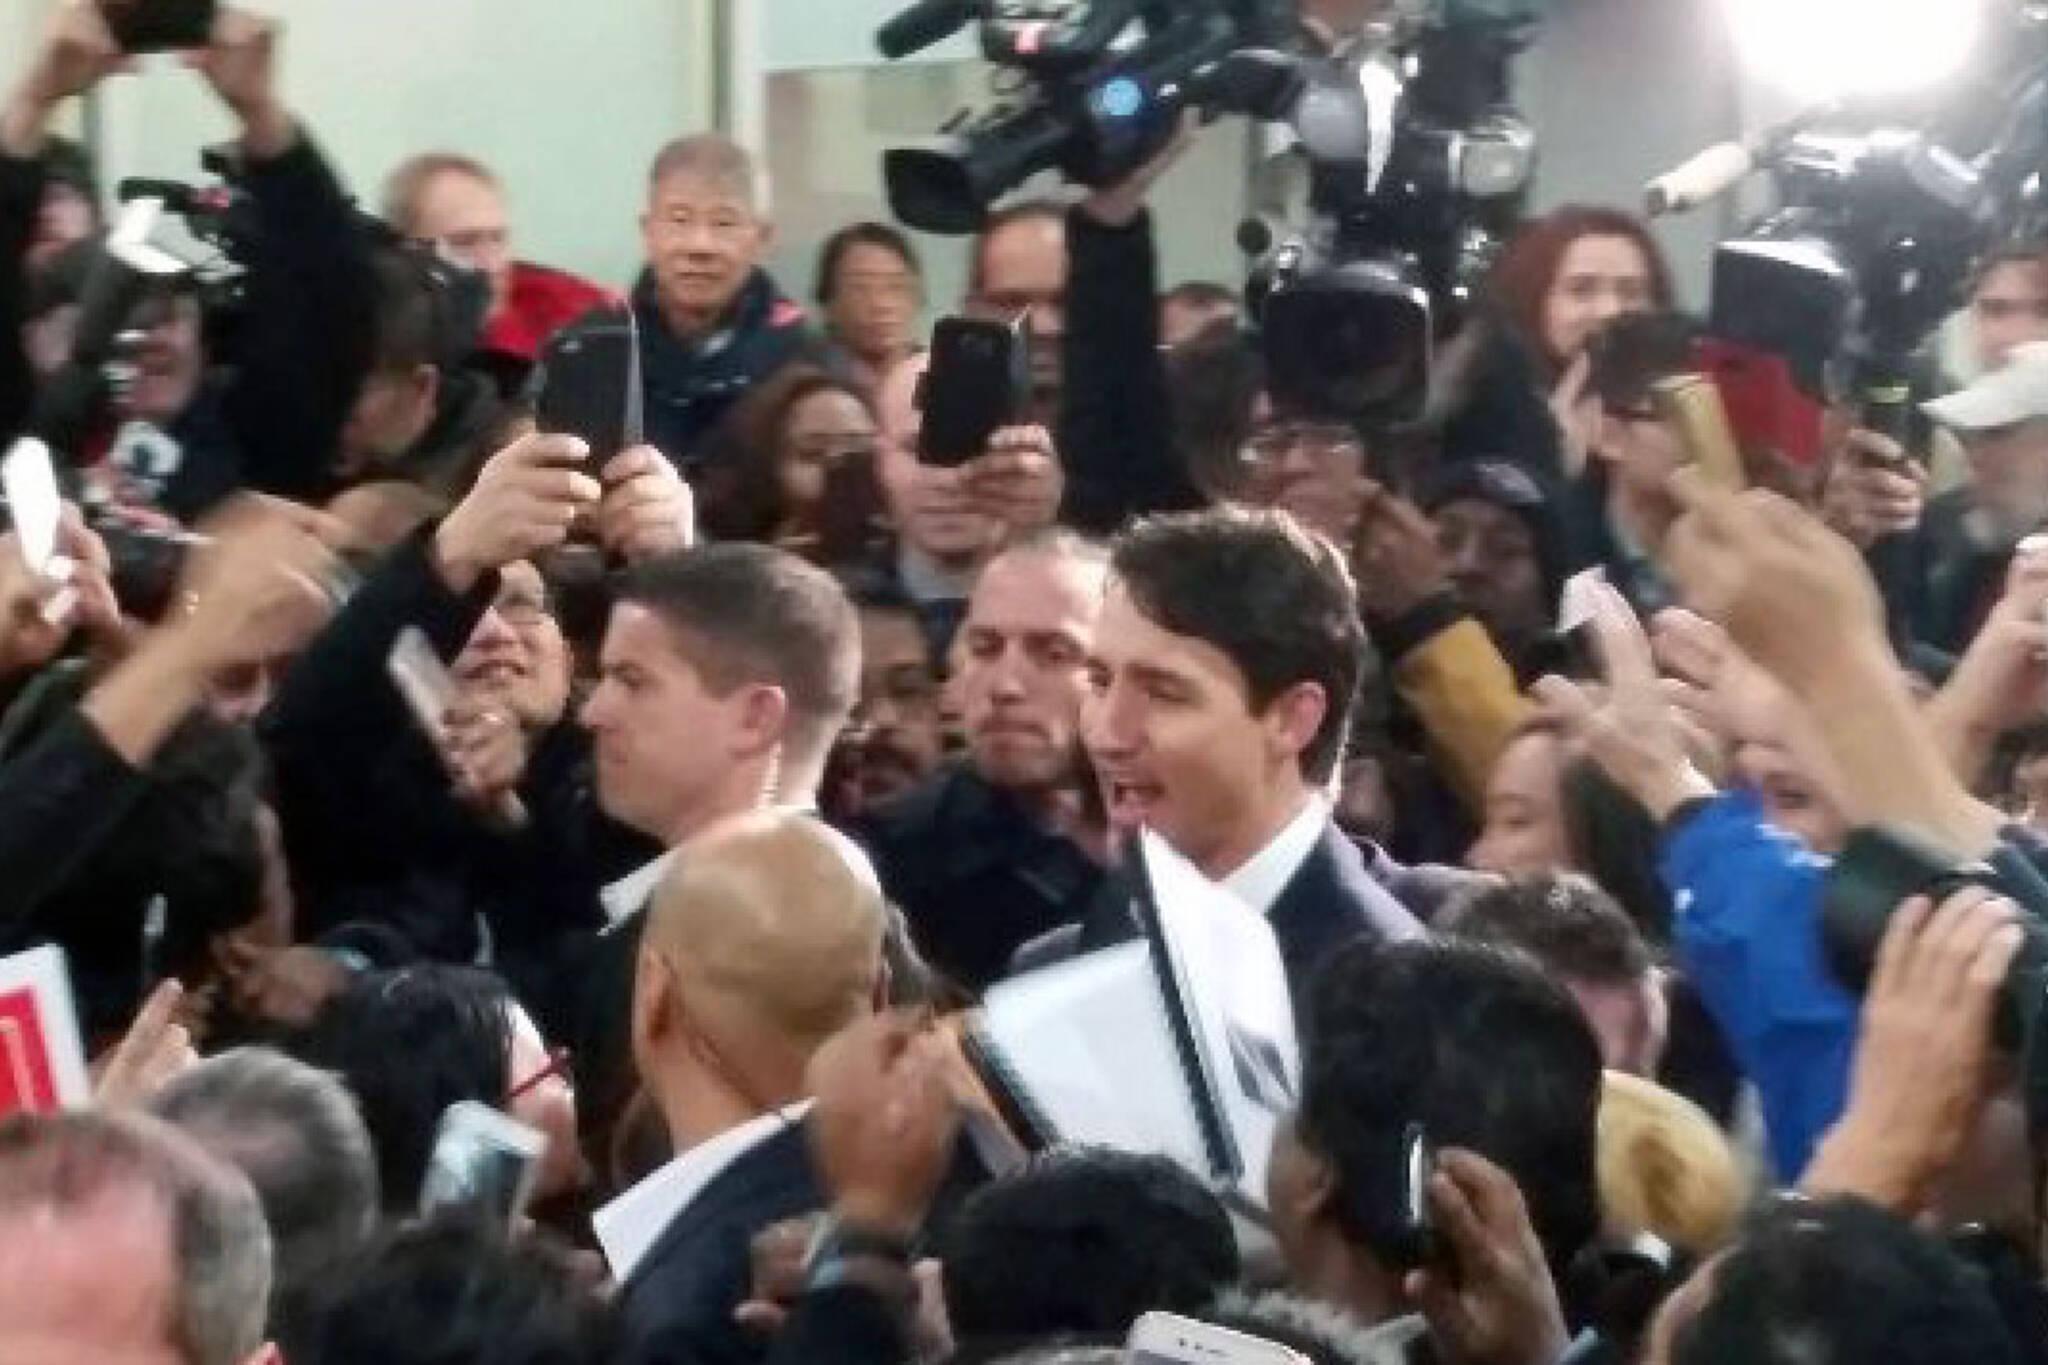 Justin Trudeau bridlewood mall